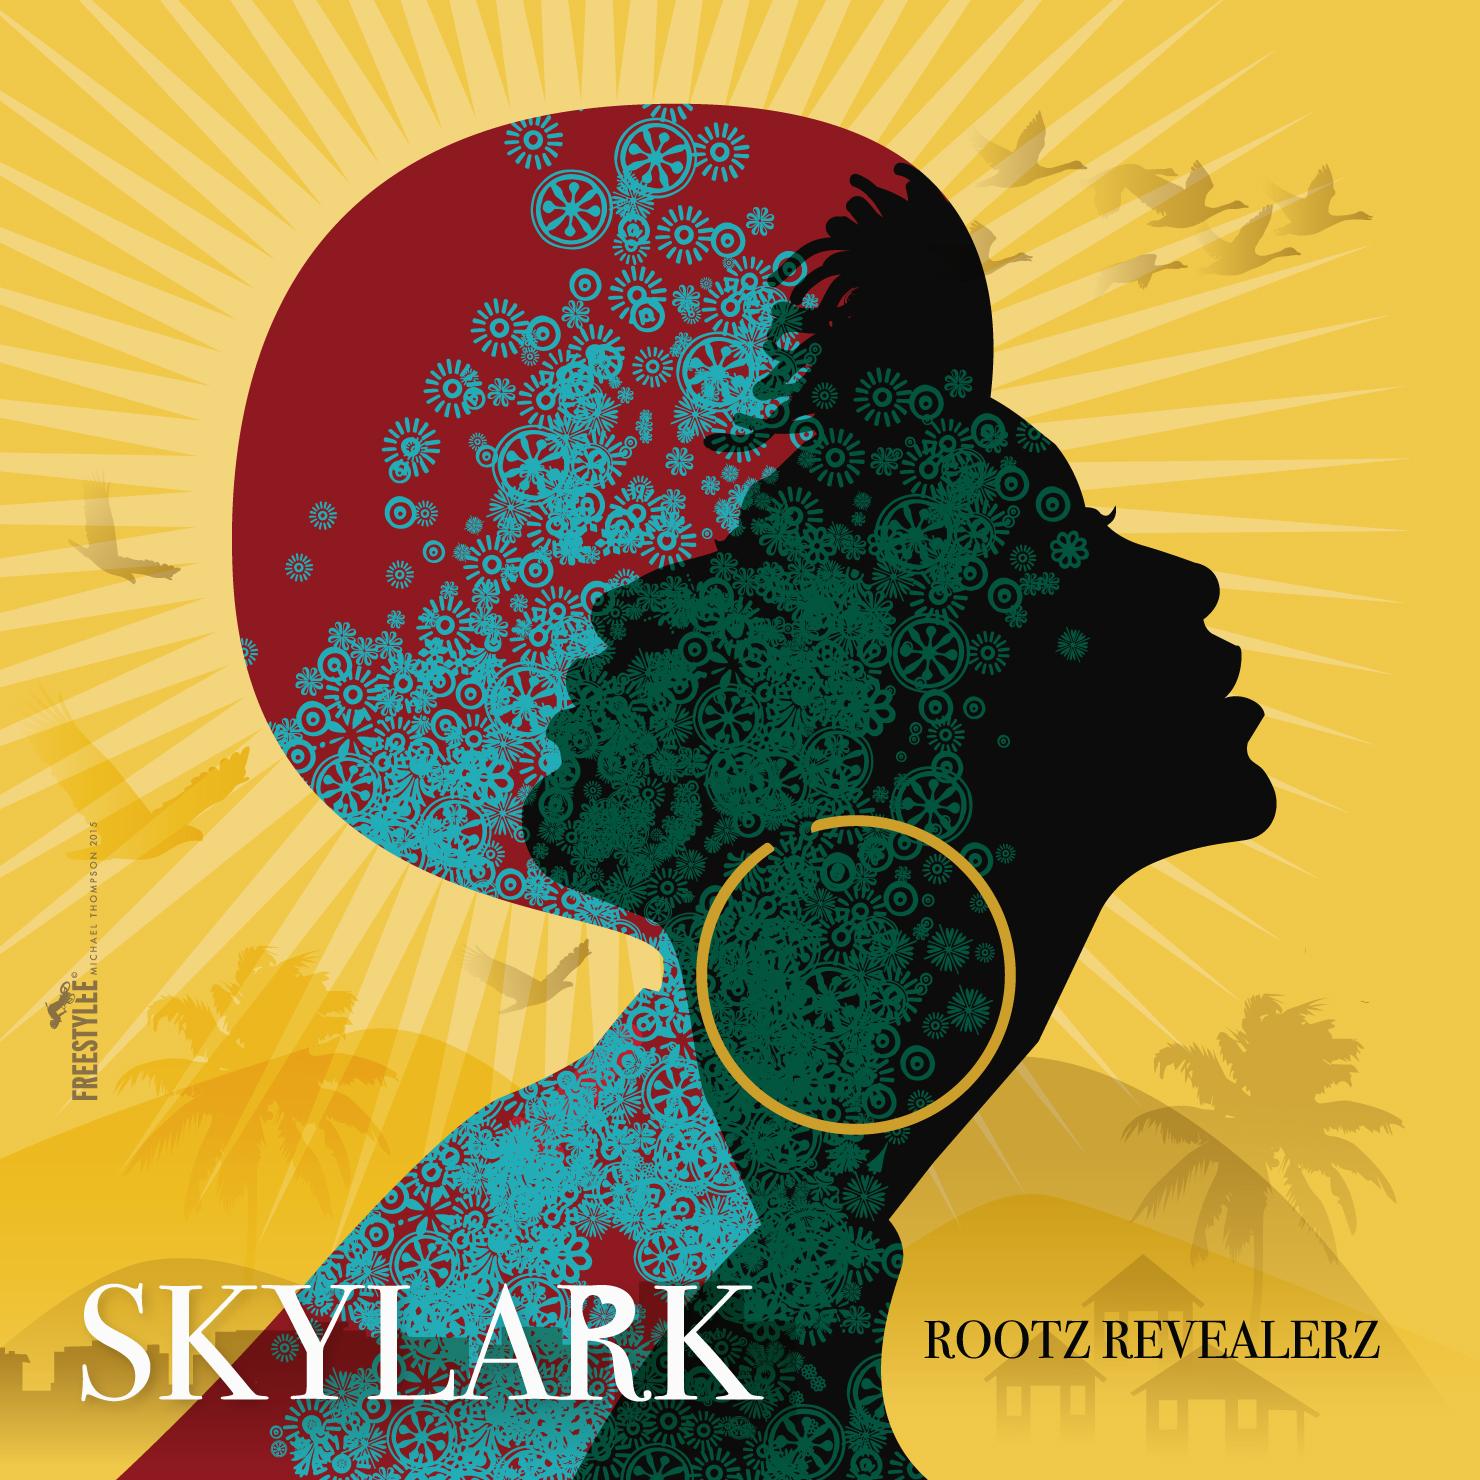 SKYLARK_002_yellow